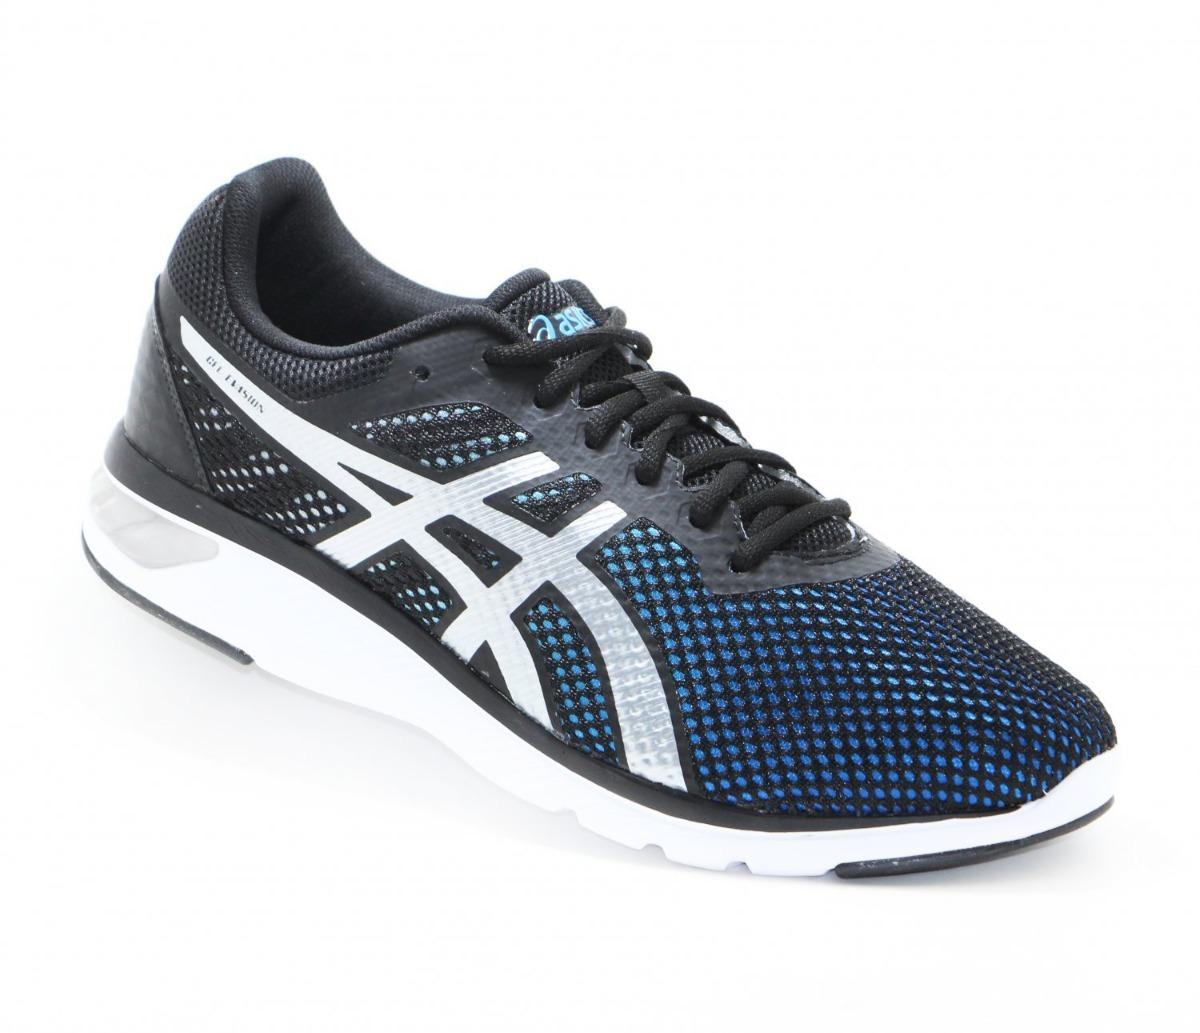 4117f3afa460b tênis asics gel evasion masculino preto azul original + nf. Carregando zoom.